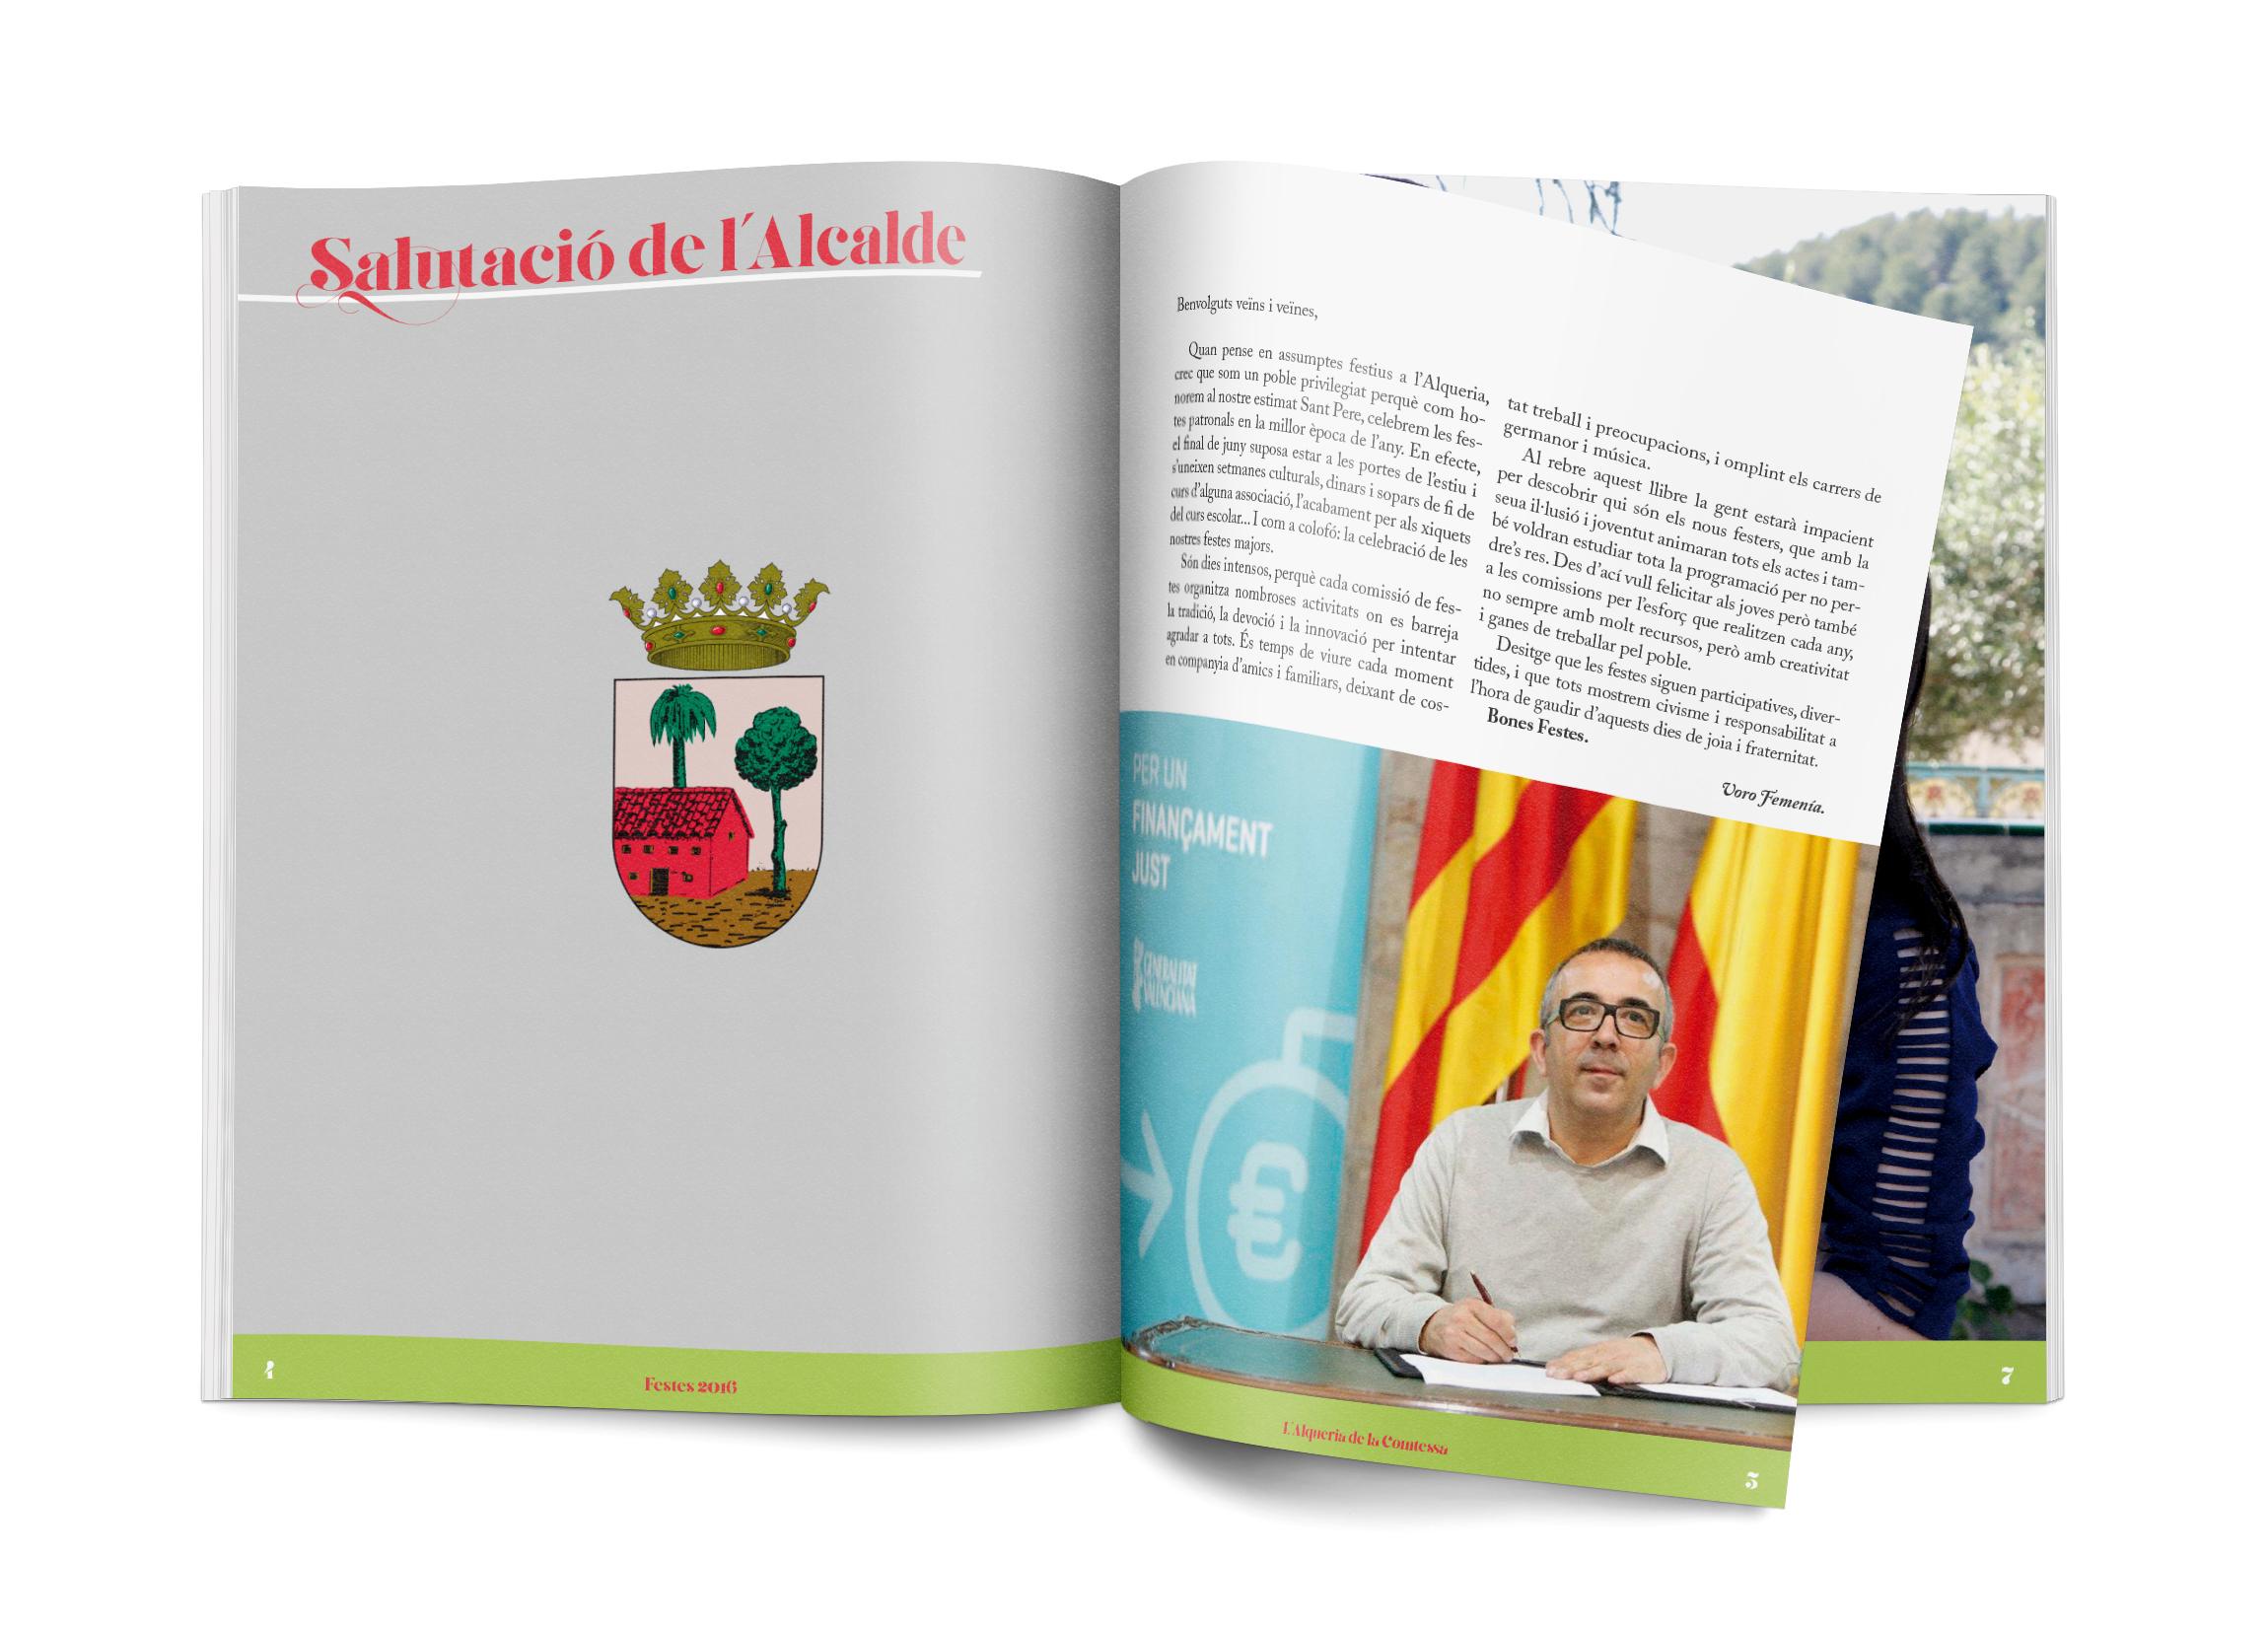 Salutacio Alcalde — Llibre de Festes 2016